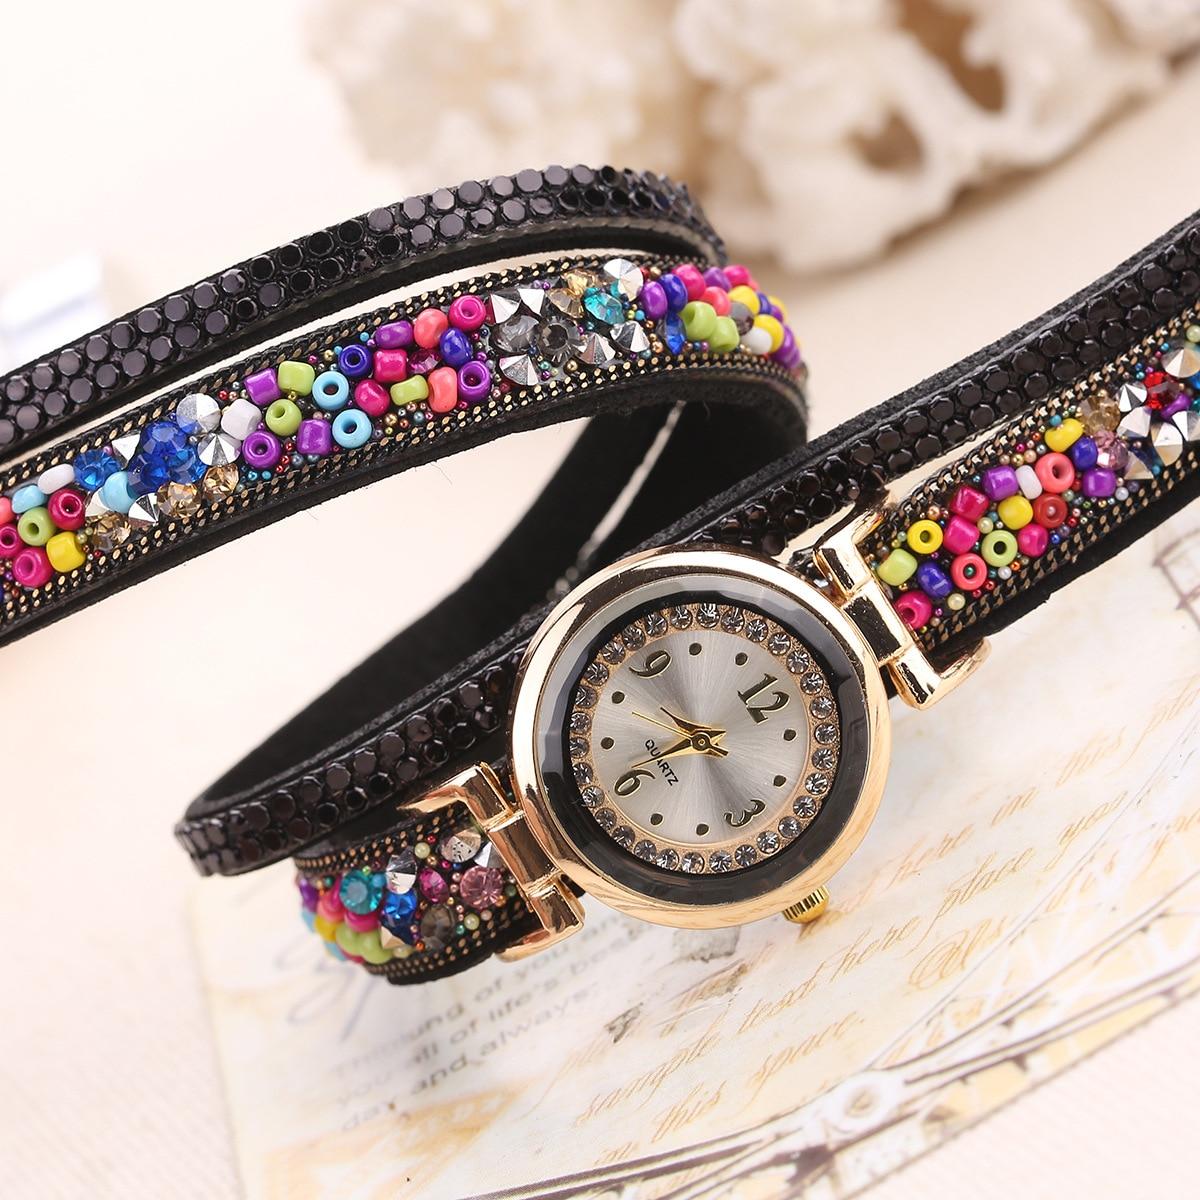 Fashion Luxury Leather Watch Kvinnor Classic Crystal Decor Armband - Damklockor - Foto 4